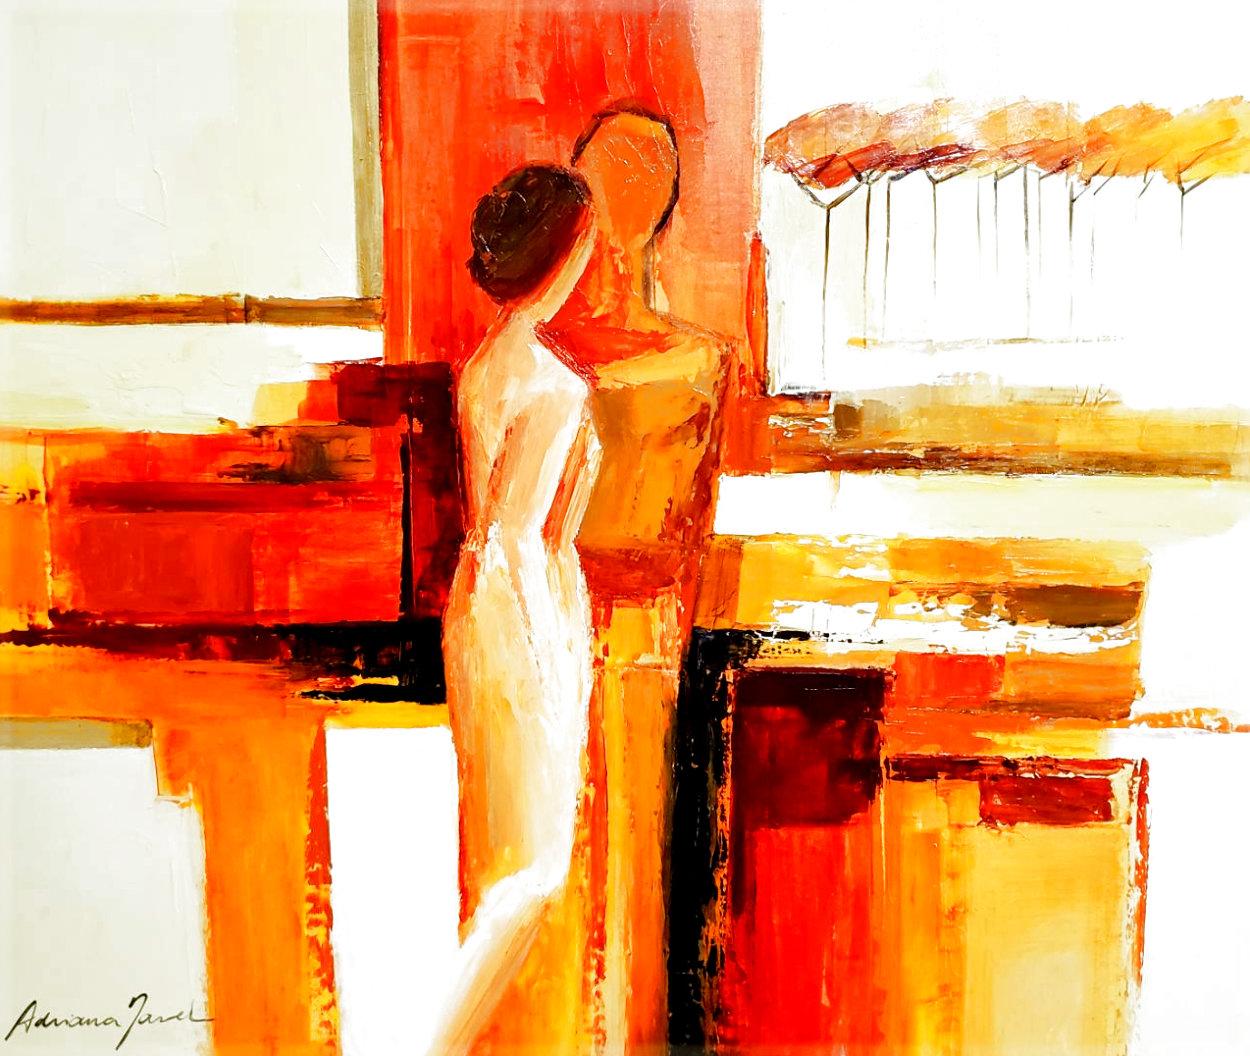 Best Friends 2006 43x51 Super Huge Original Painting by Adriana Naveh